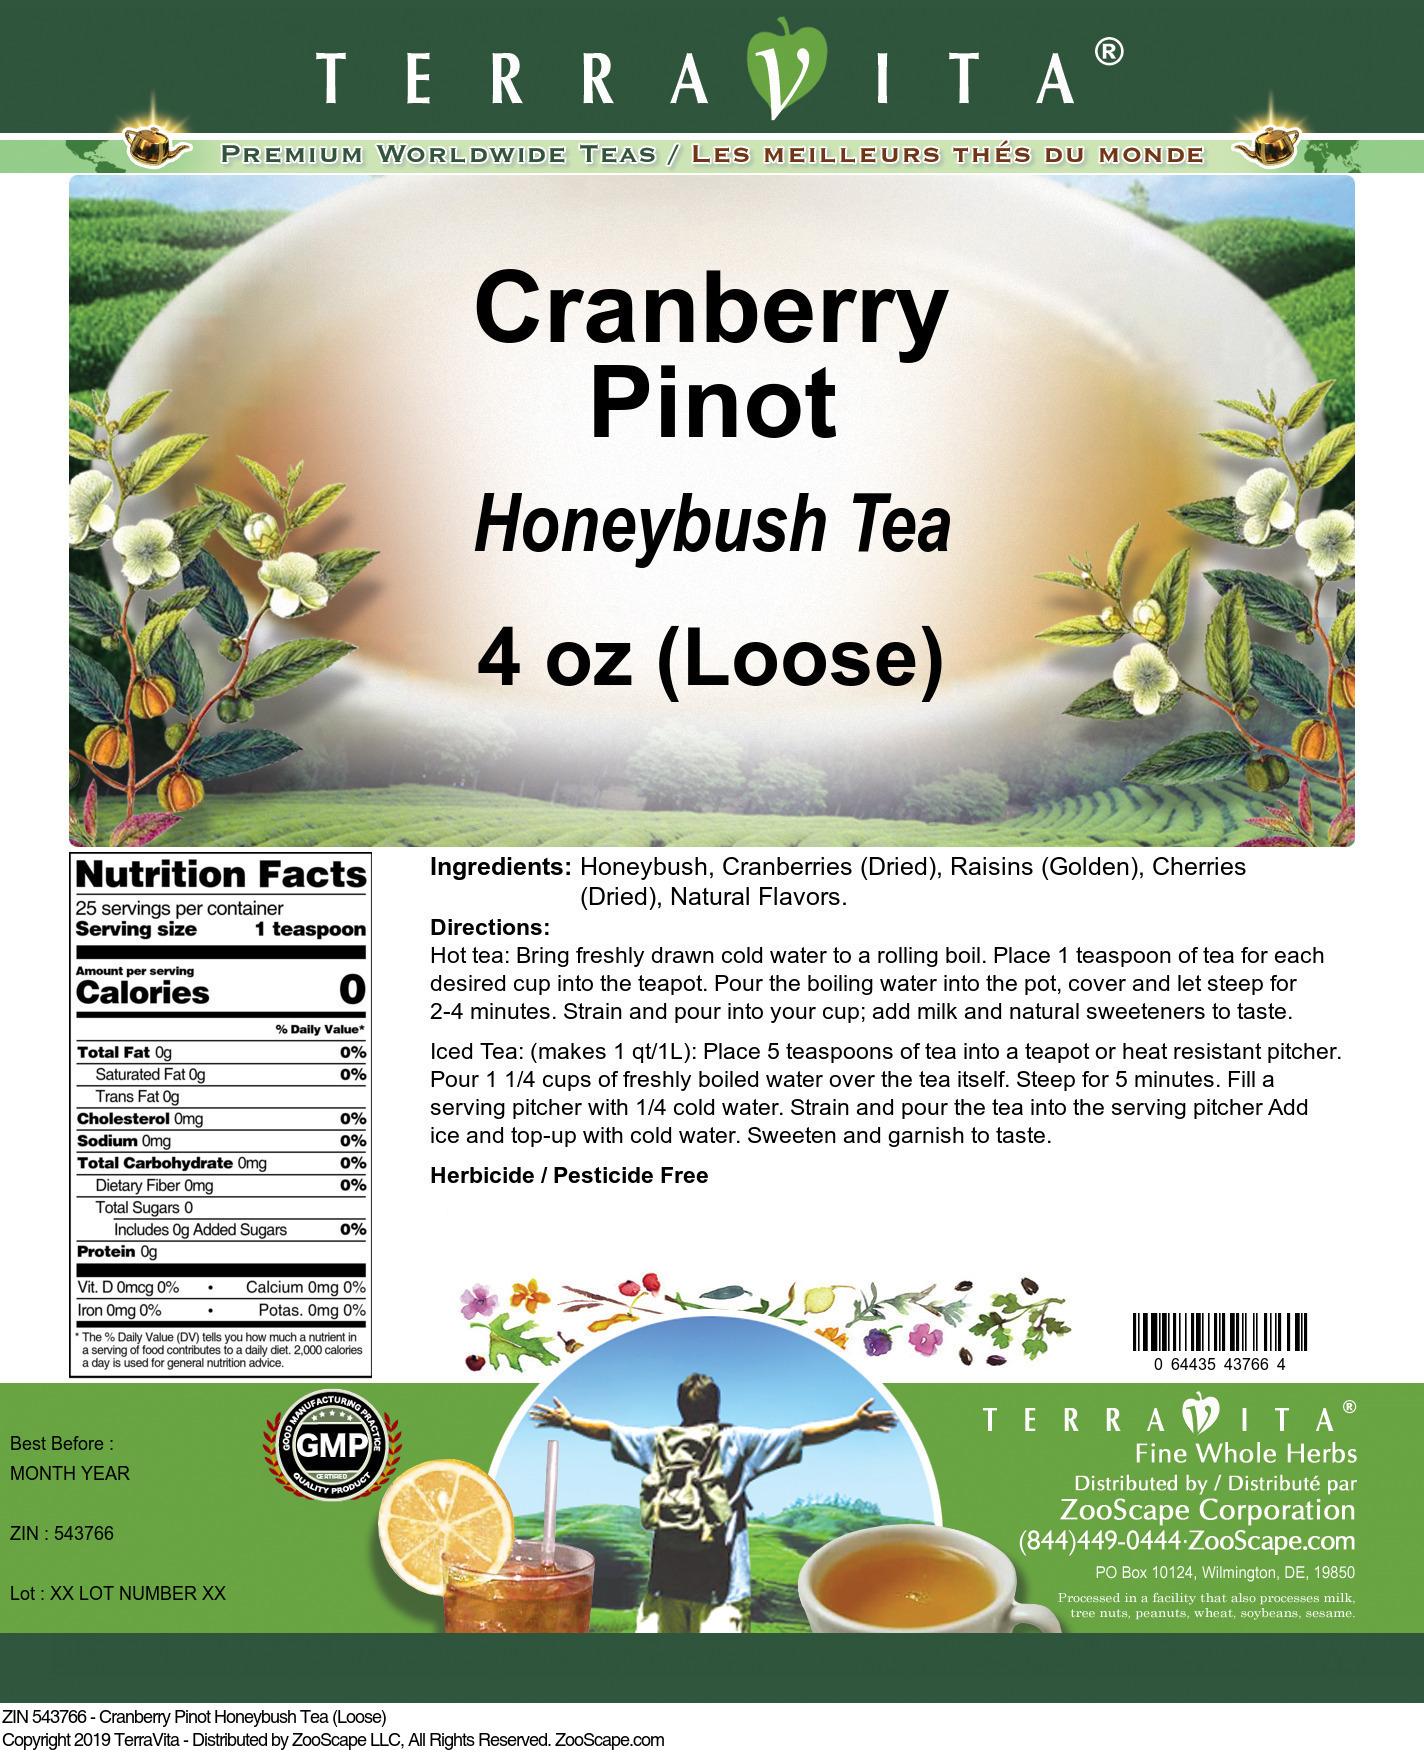 Cranberry Pinot Honeybush Tea (Loose)